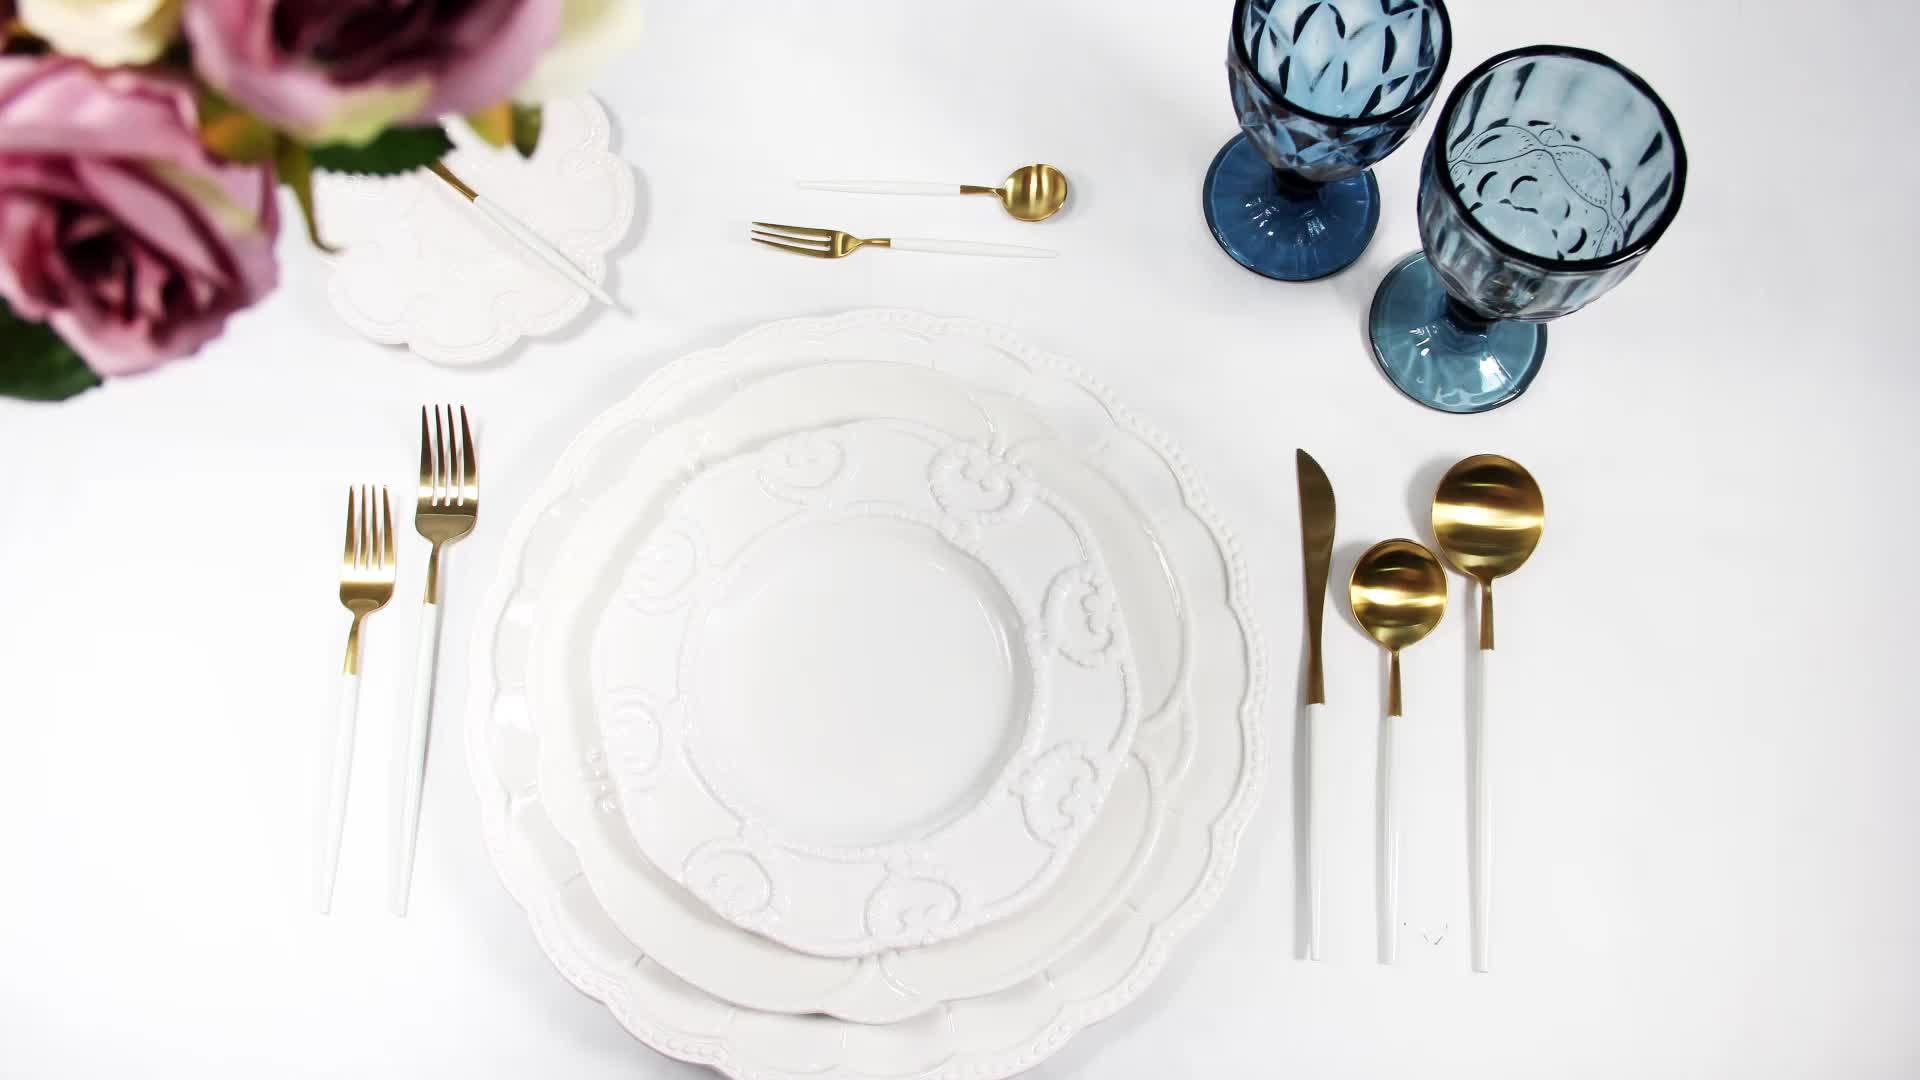 Wholesale OEM ODM high quality luxury new design home restaurant tableware ceramic ethiopian coffee cup set dinnerware set